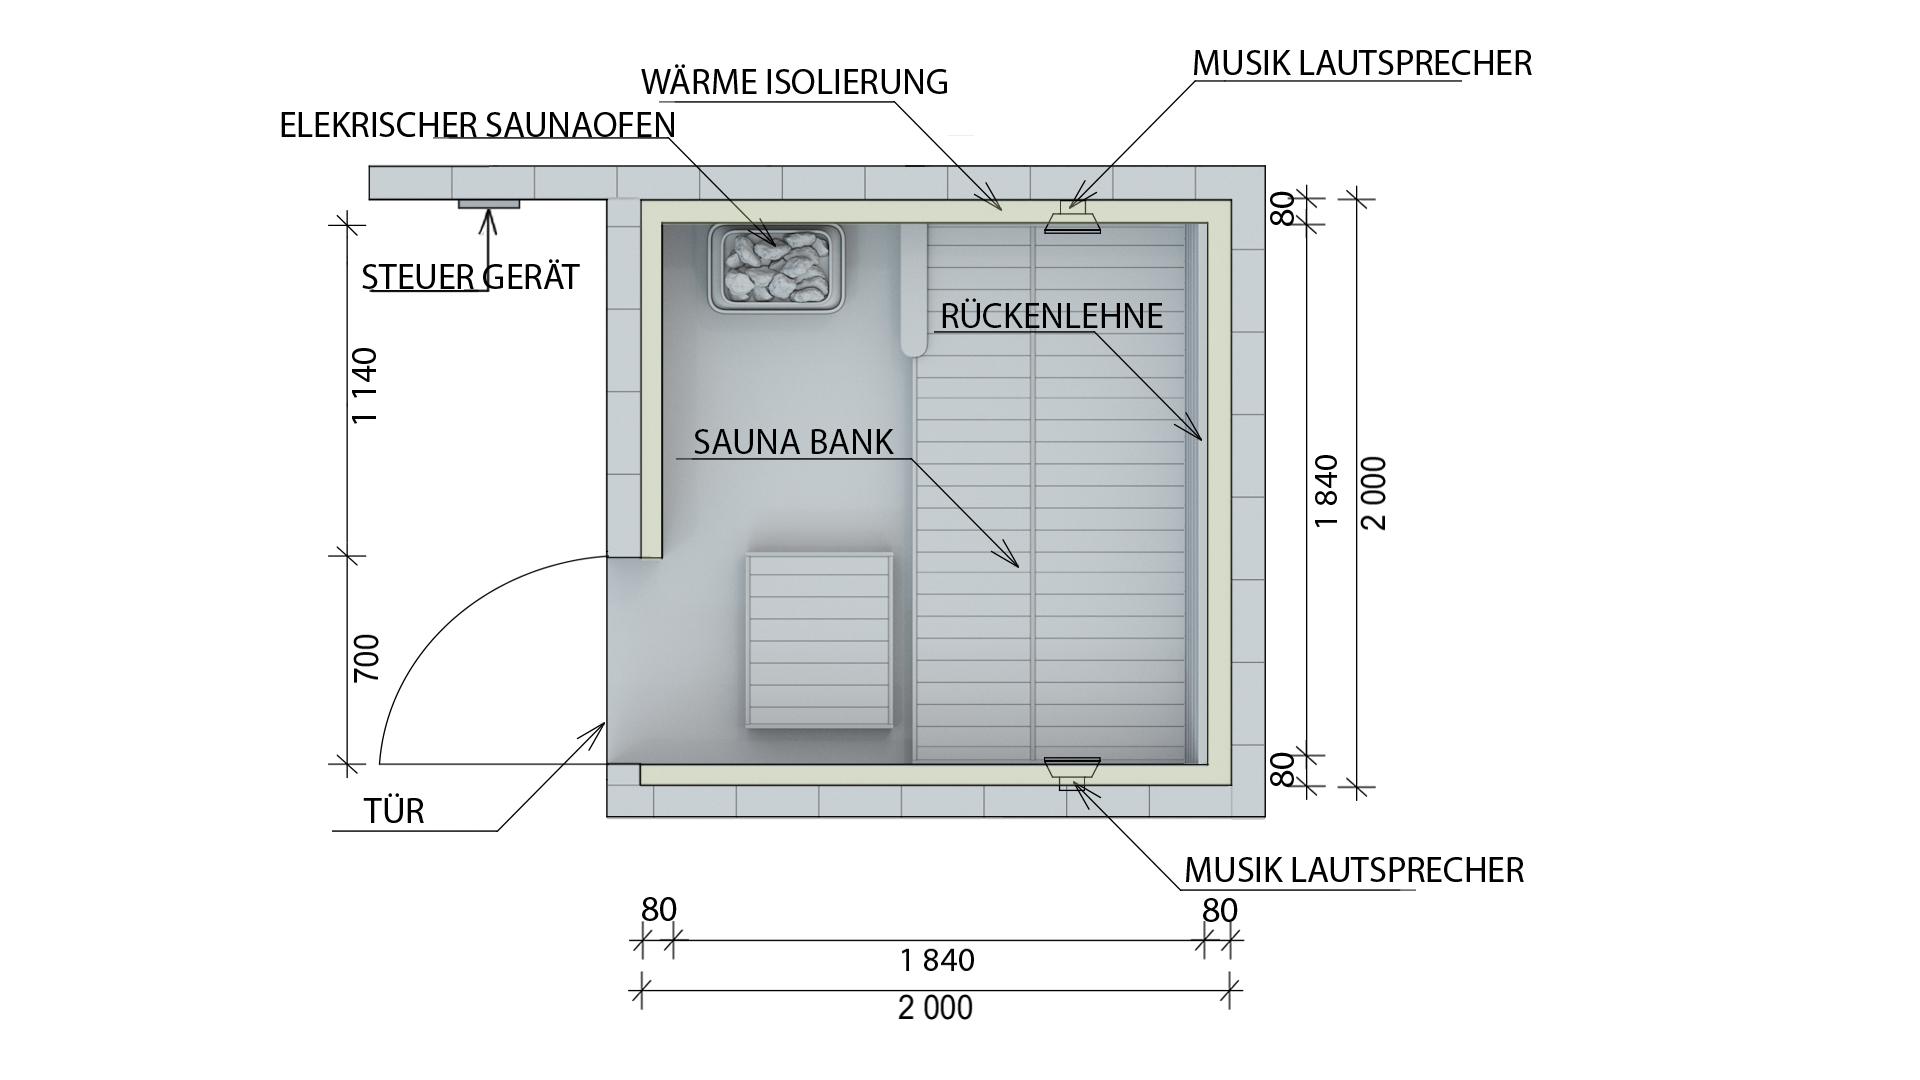 Full Size of Außensauna Wandaufbau Saunaintercom Wohnzimmer Außensauna Wandaufbau